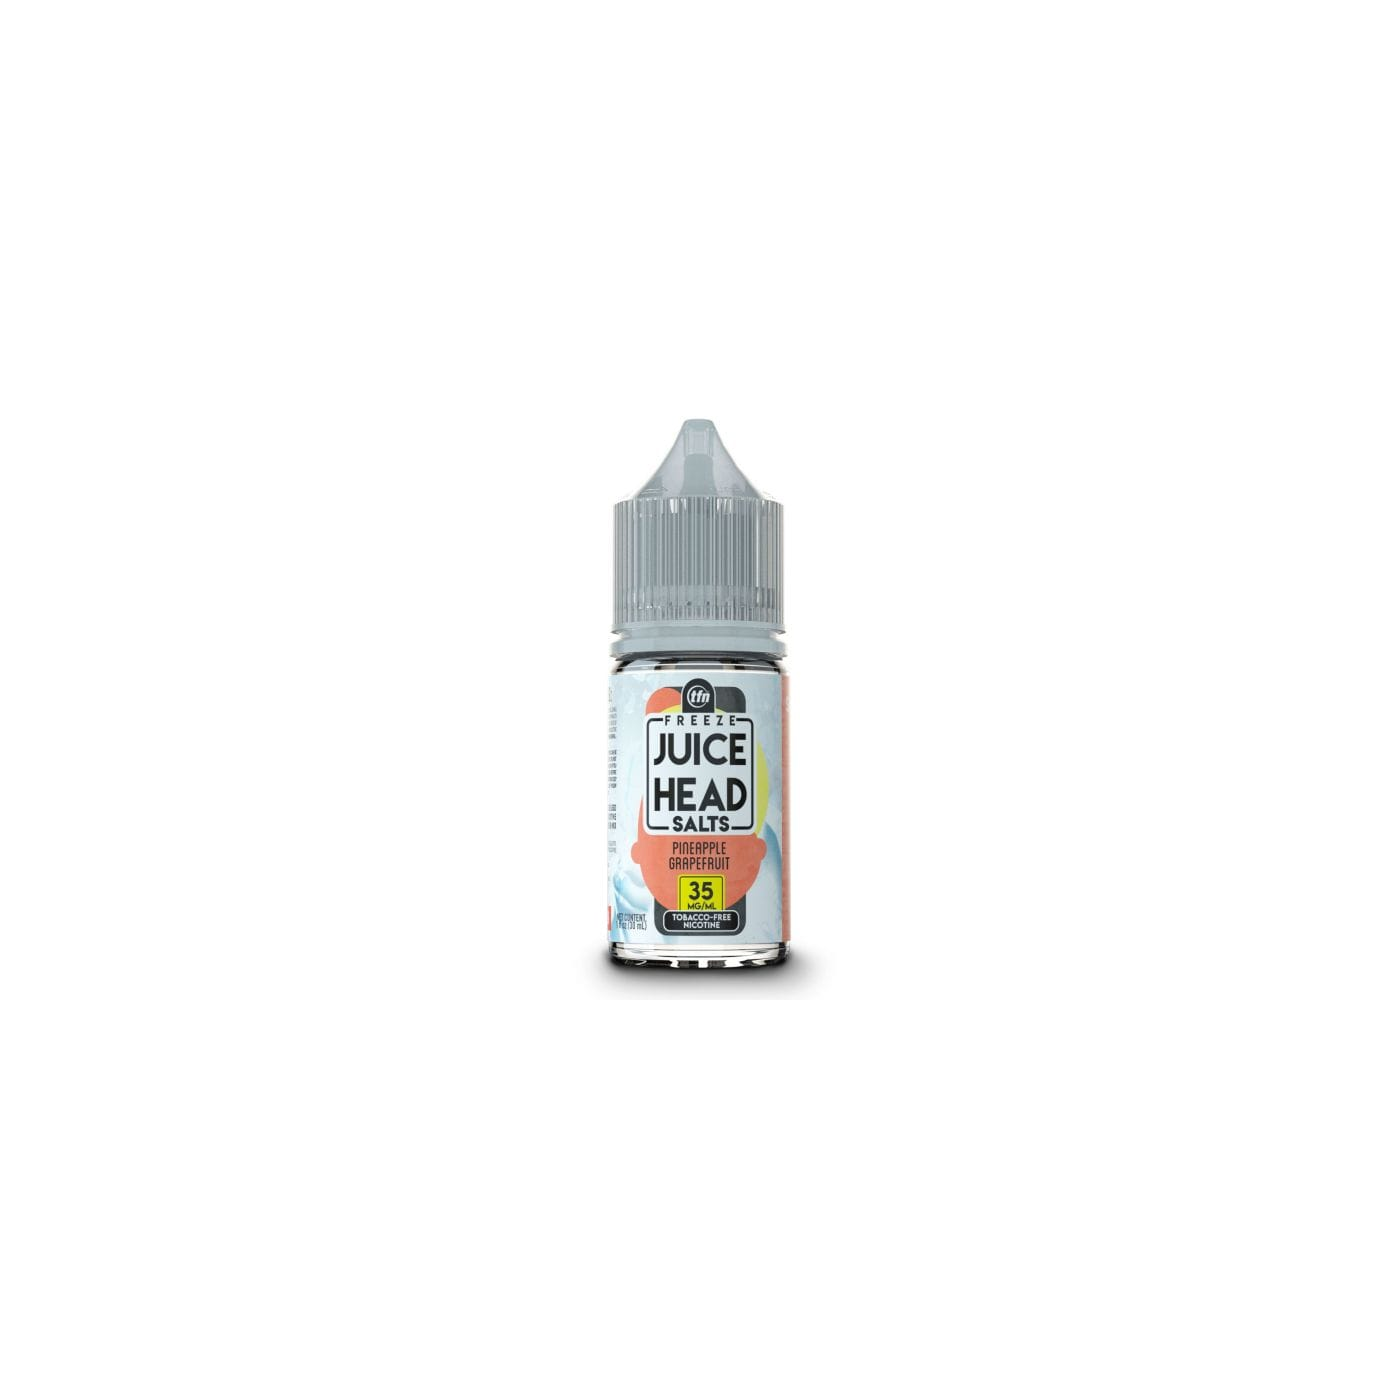 Juice Head TFN Salts Pineapple Grapefruit Freeze